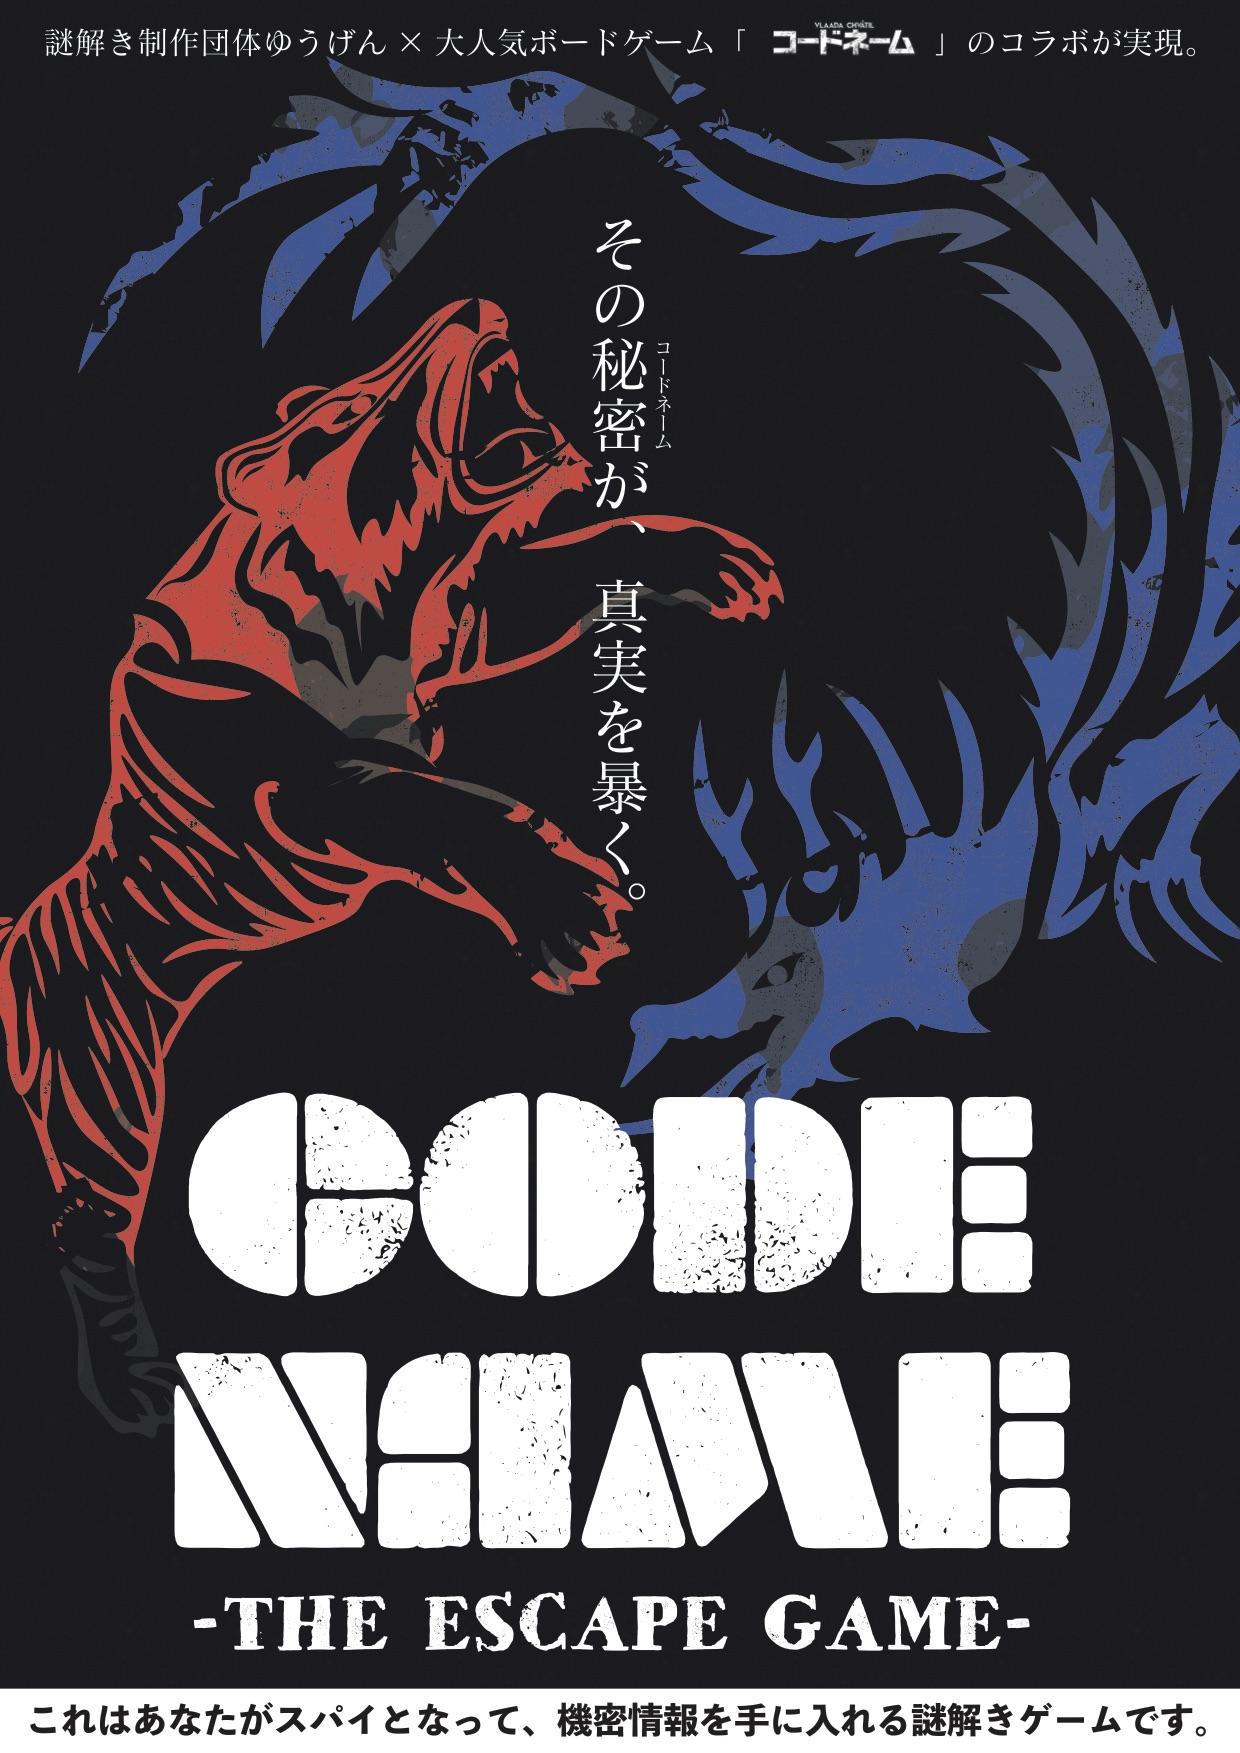 CODE NAME(9/19,20開催)